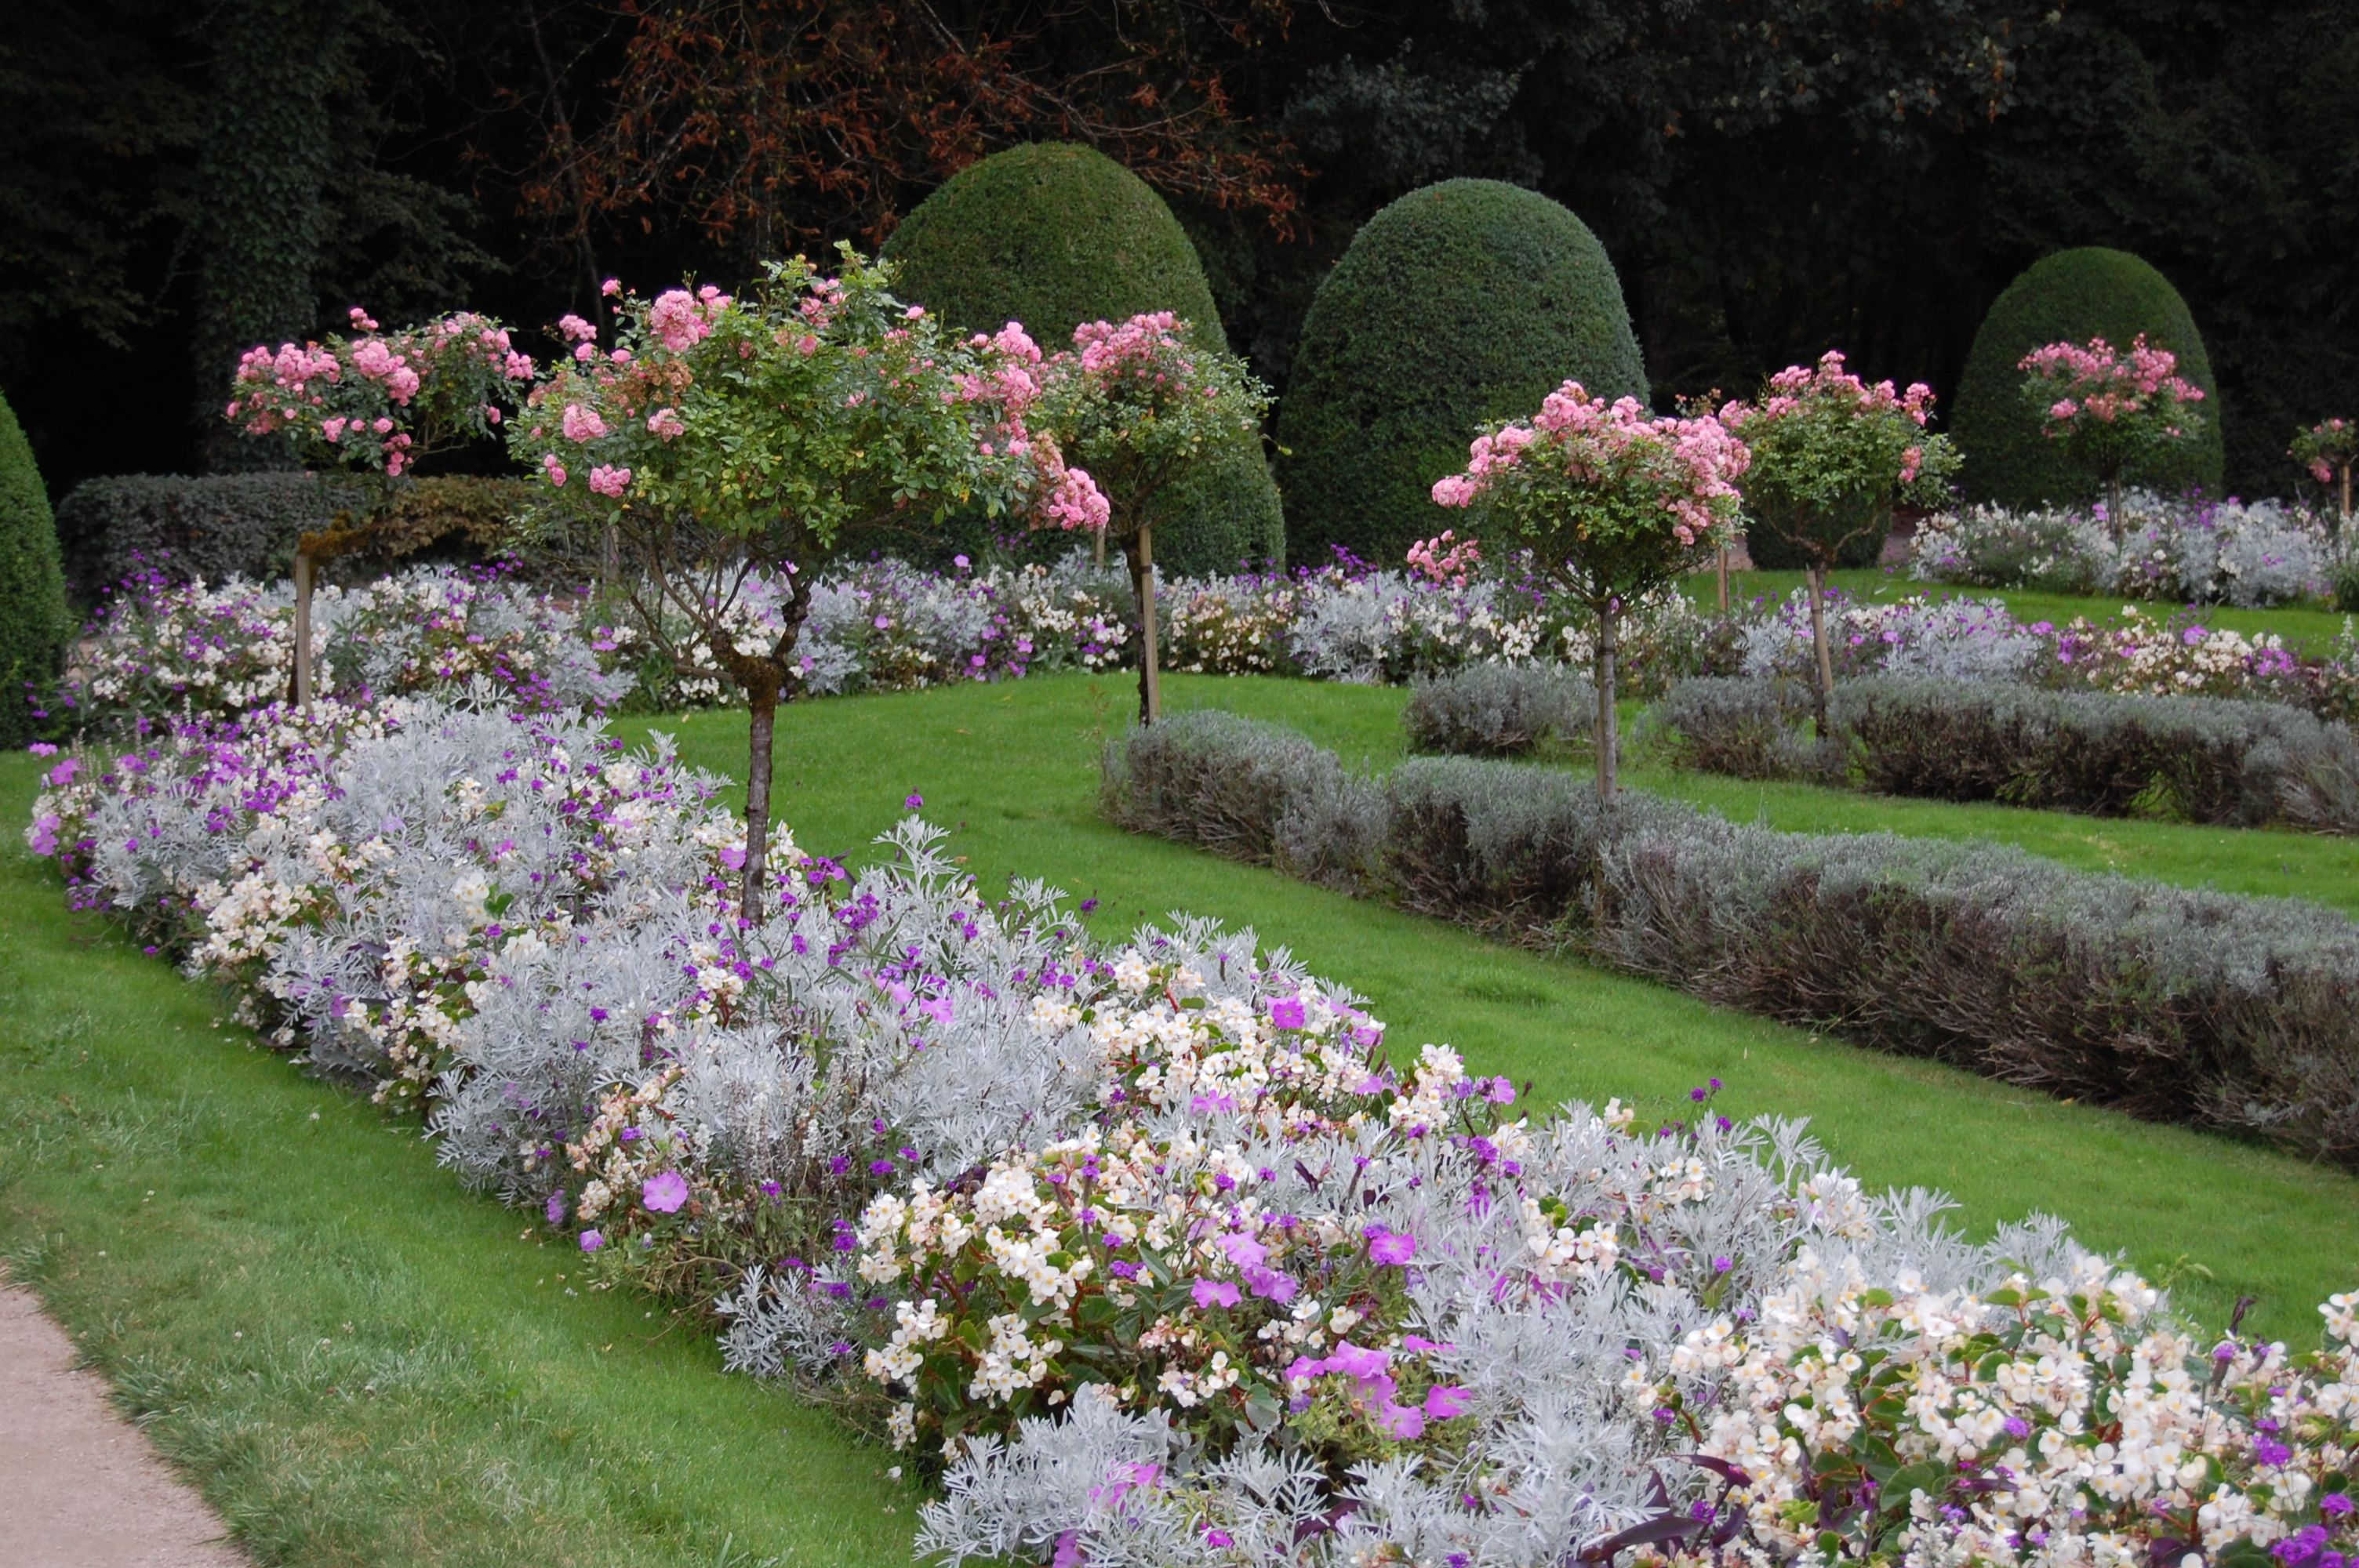 Rose garden ideas pictures -  Rose Garden Landscaping Ideas Google Search Download